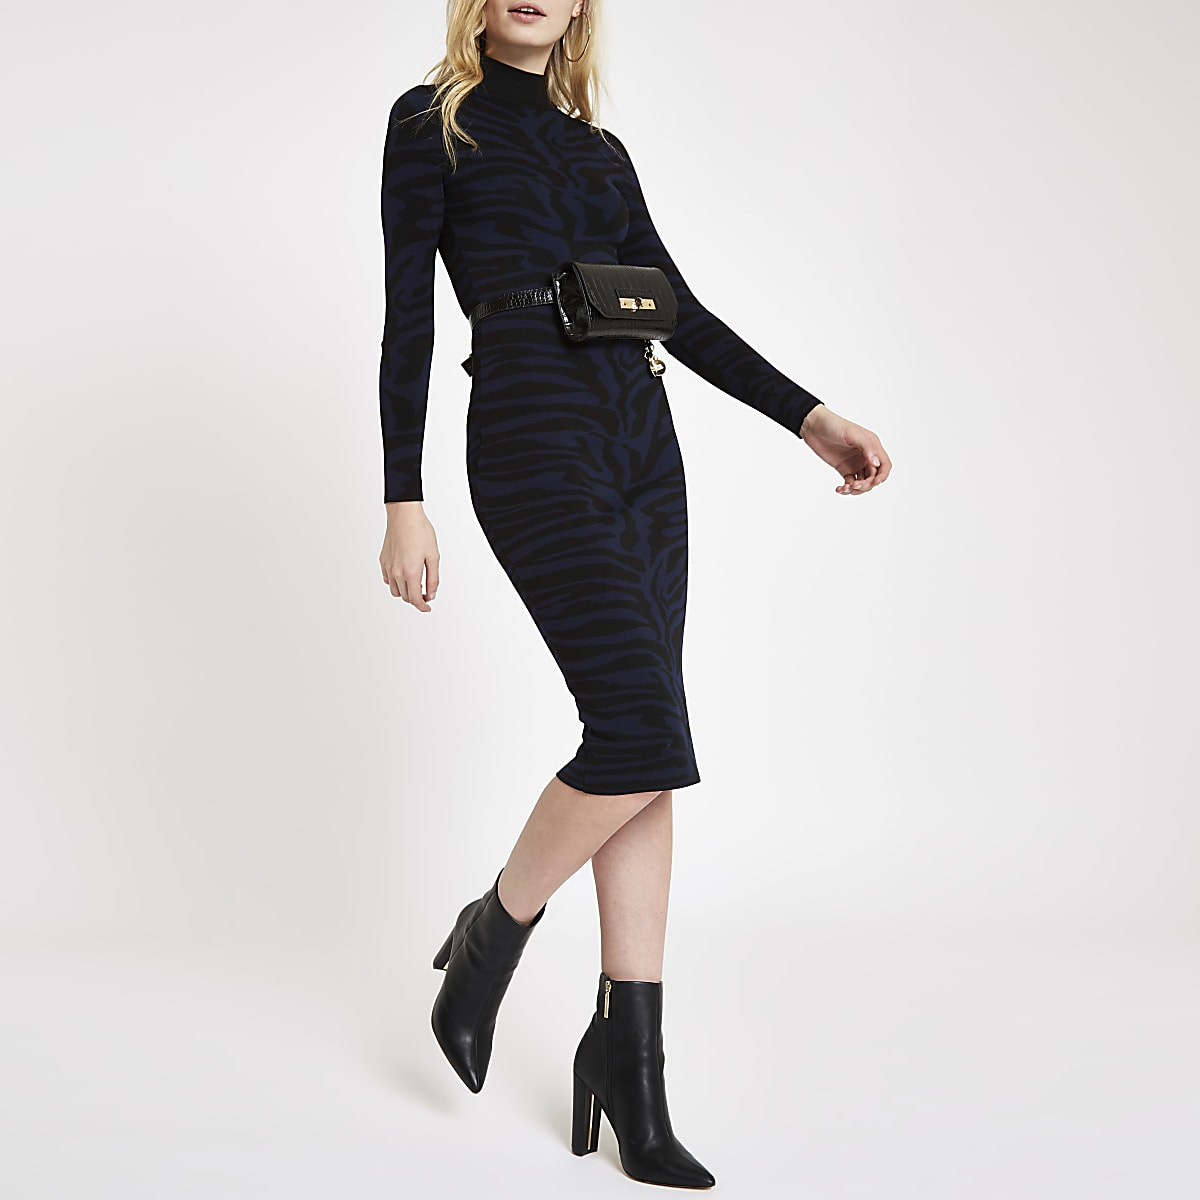 Hoogsluitende marineblauwe bodyconmidi-jurk met zebraprint